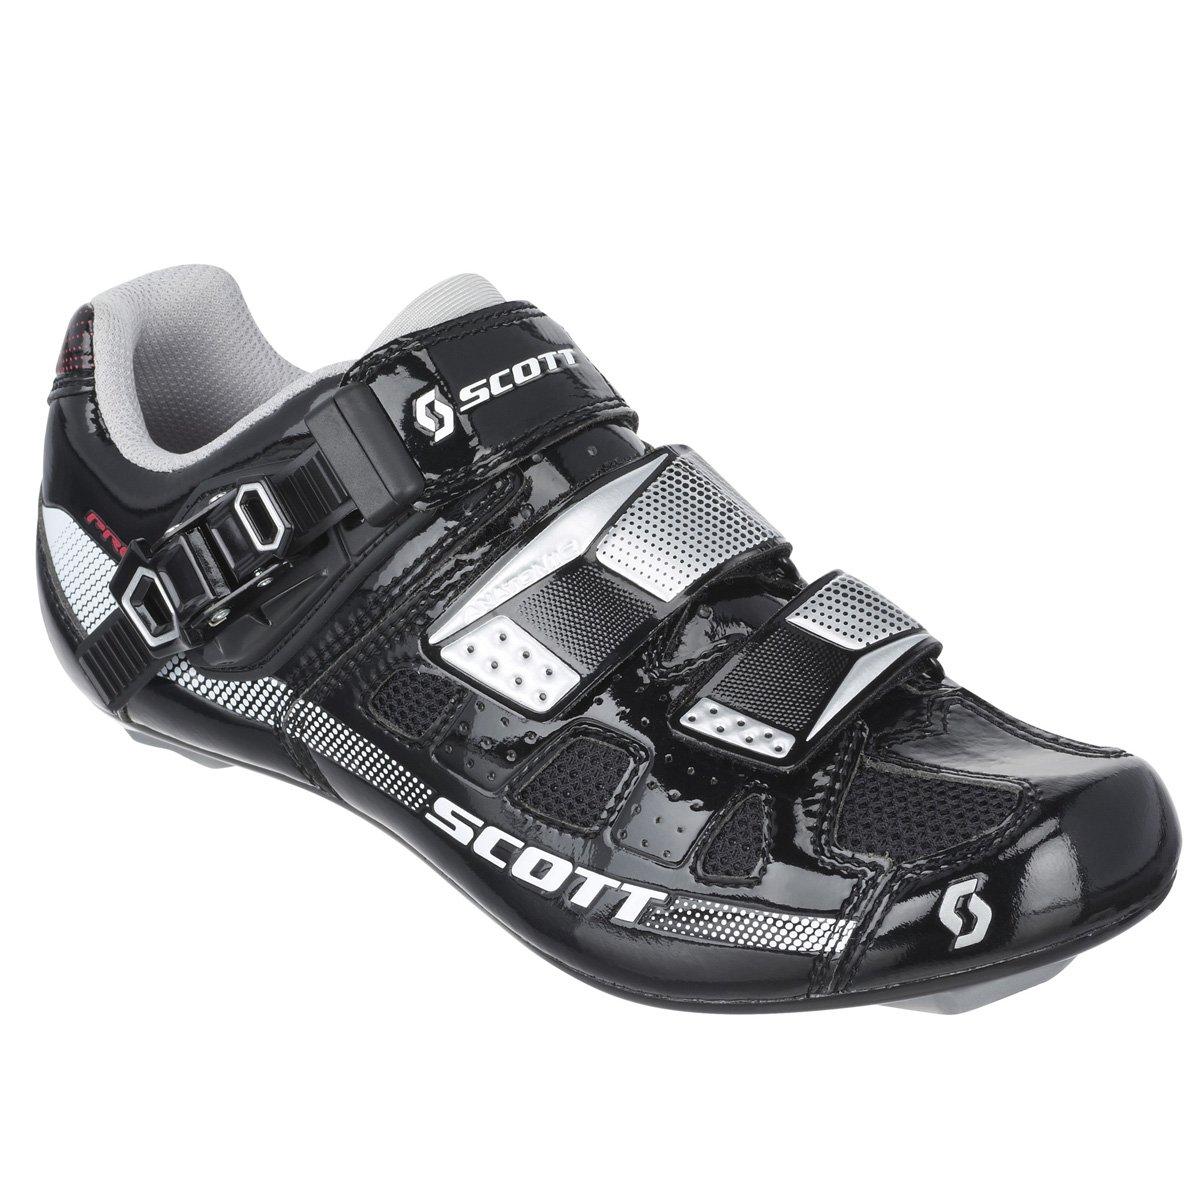 Scott Sports 2016 Women's Pro Road Cycling Shoe - 242137-4314 (black/white gloss - 39.0)